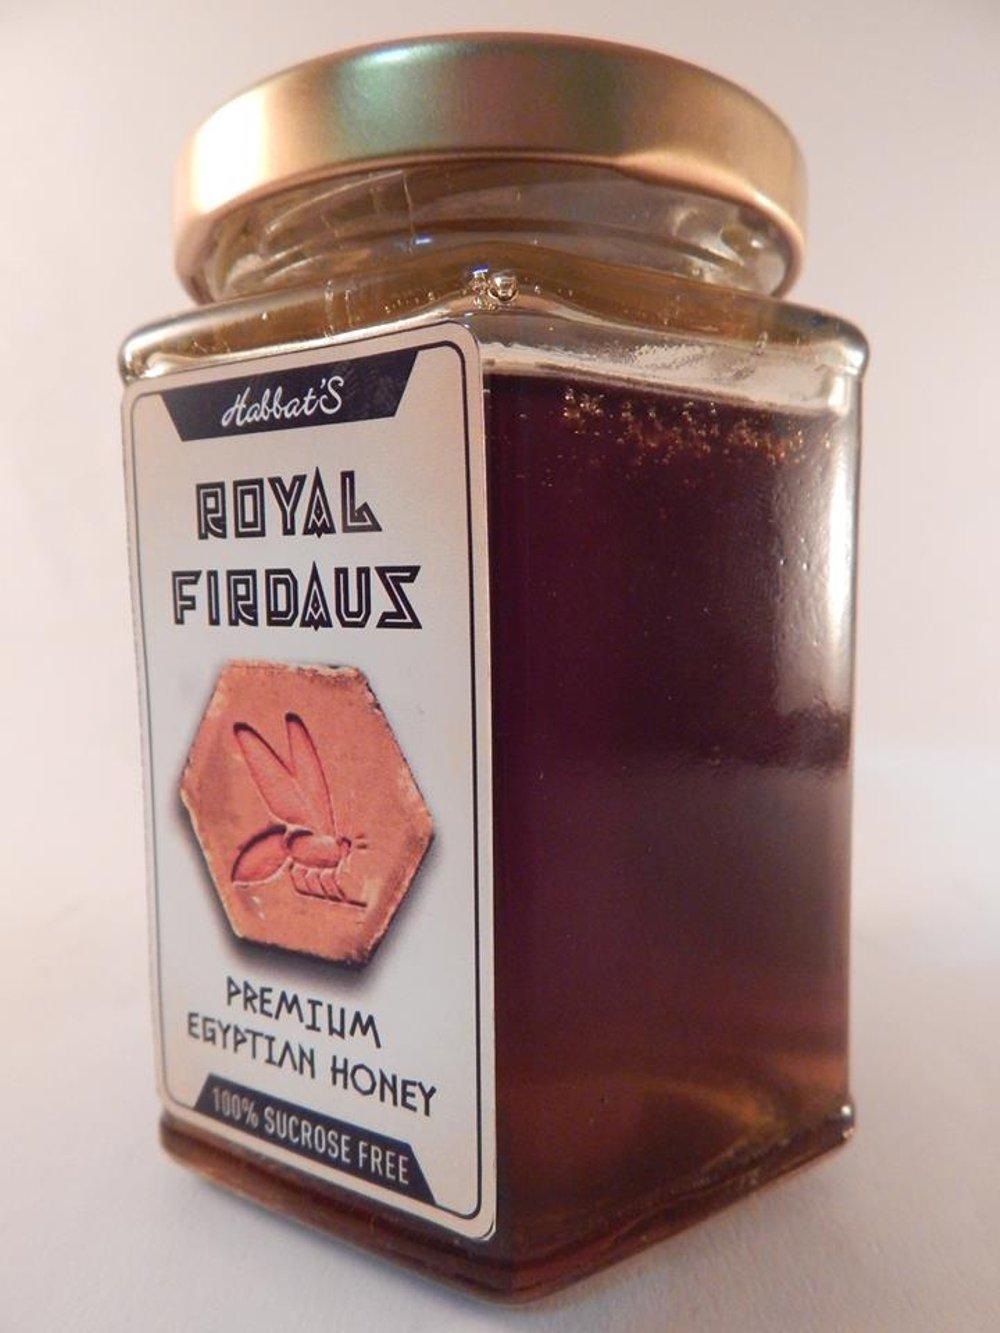 Daftar Harga Madu Royal Honey Murah Etumax Vip Original From Malaysia Suplemen Pria Habbats Firdaus 230 Gram Premium Egyptian